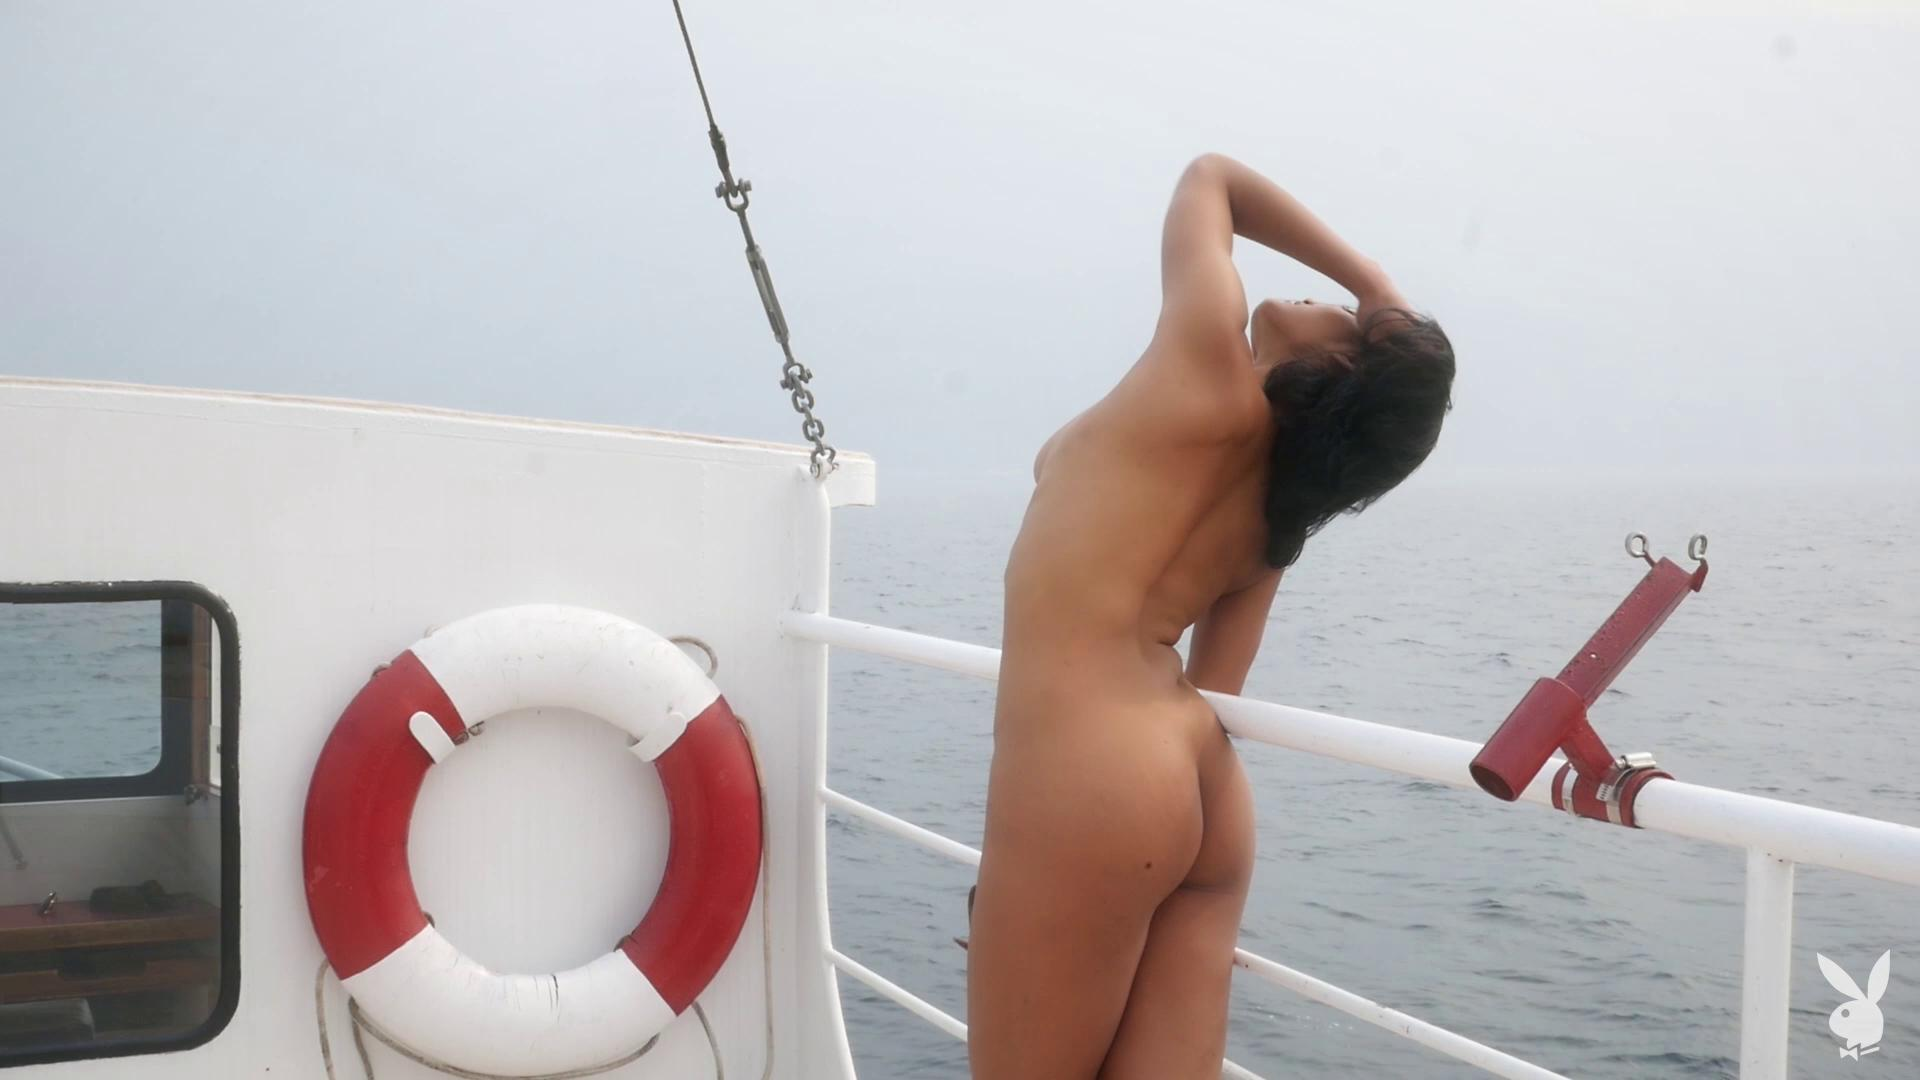 PlayboyPlus – Angel Constance Sensual Voyage